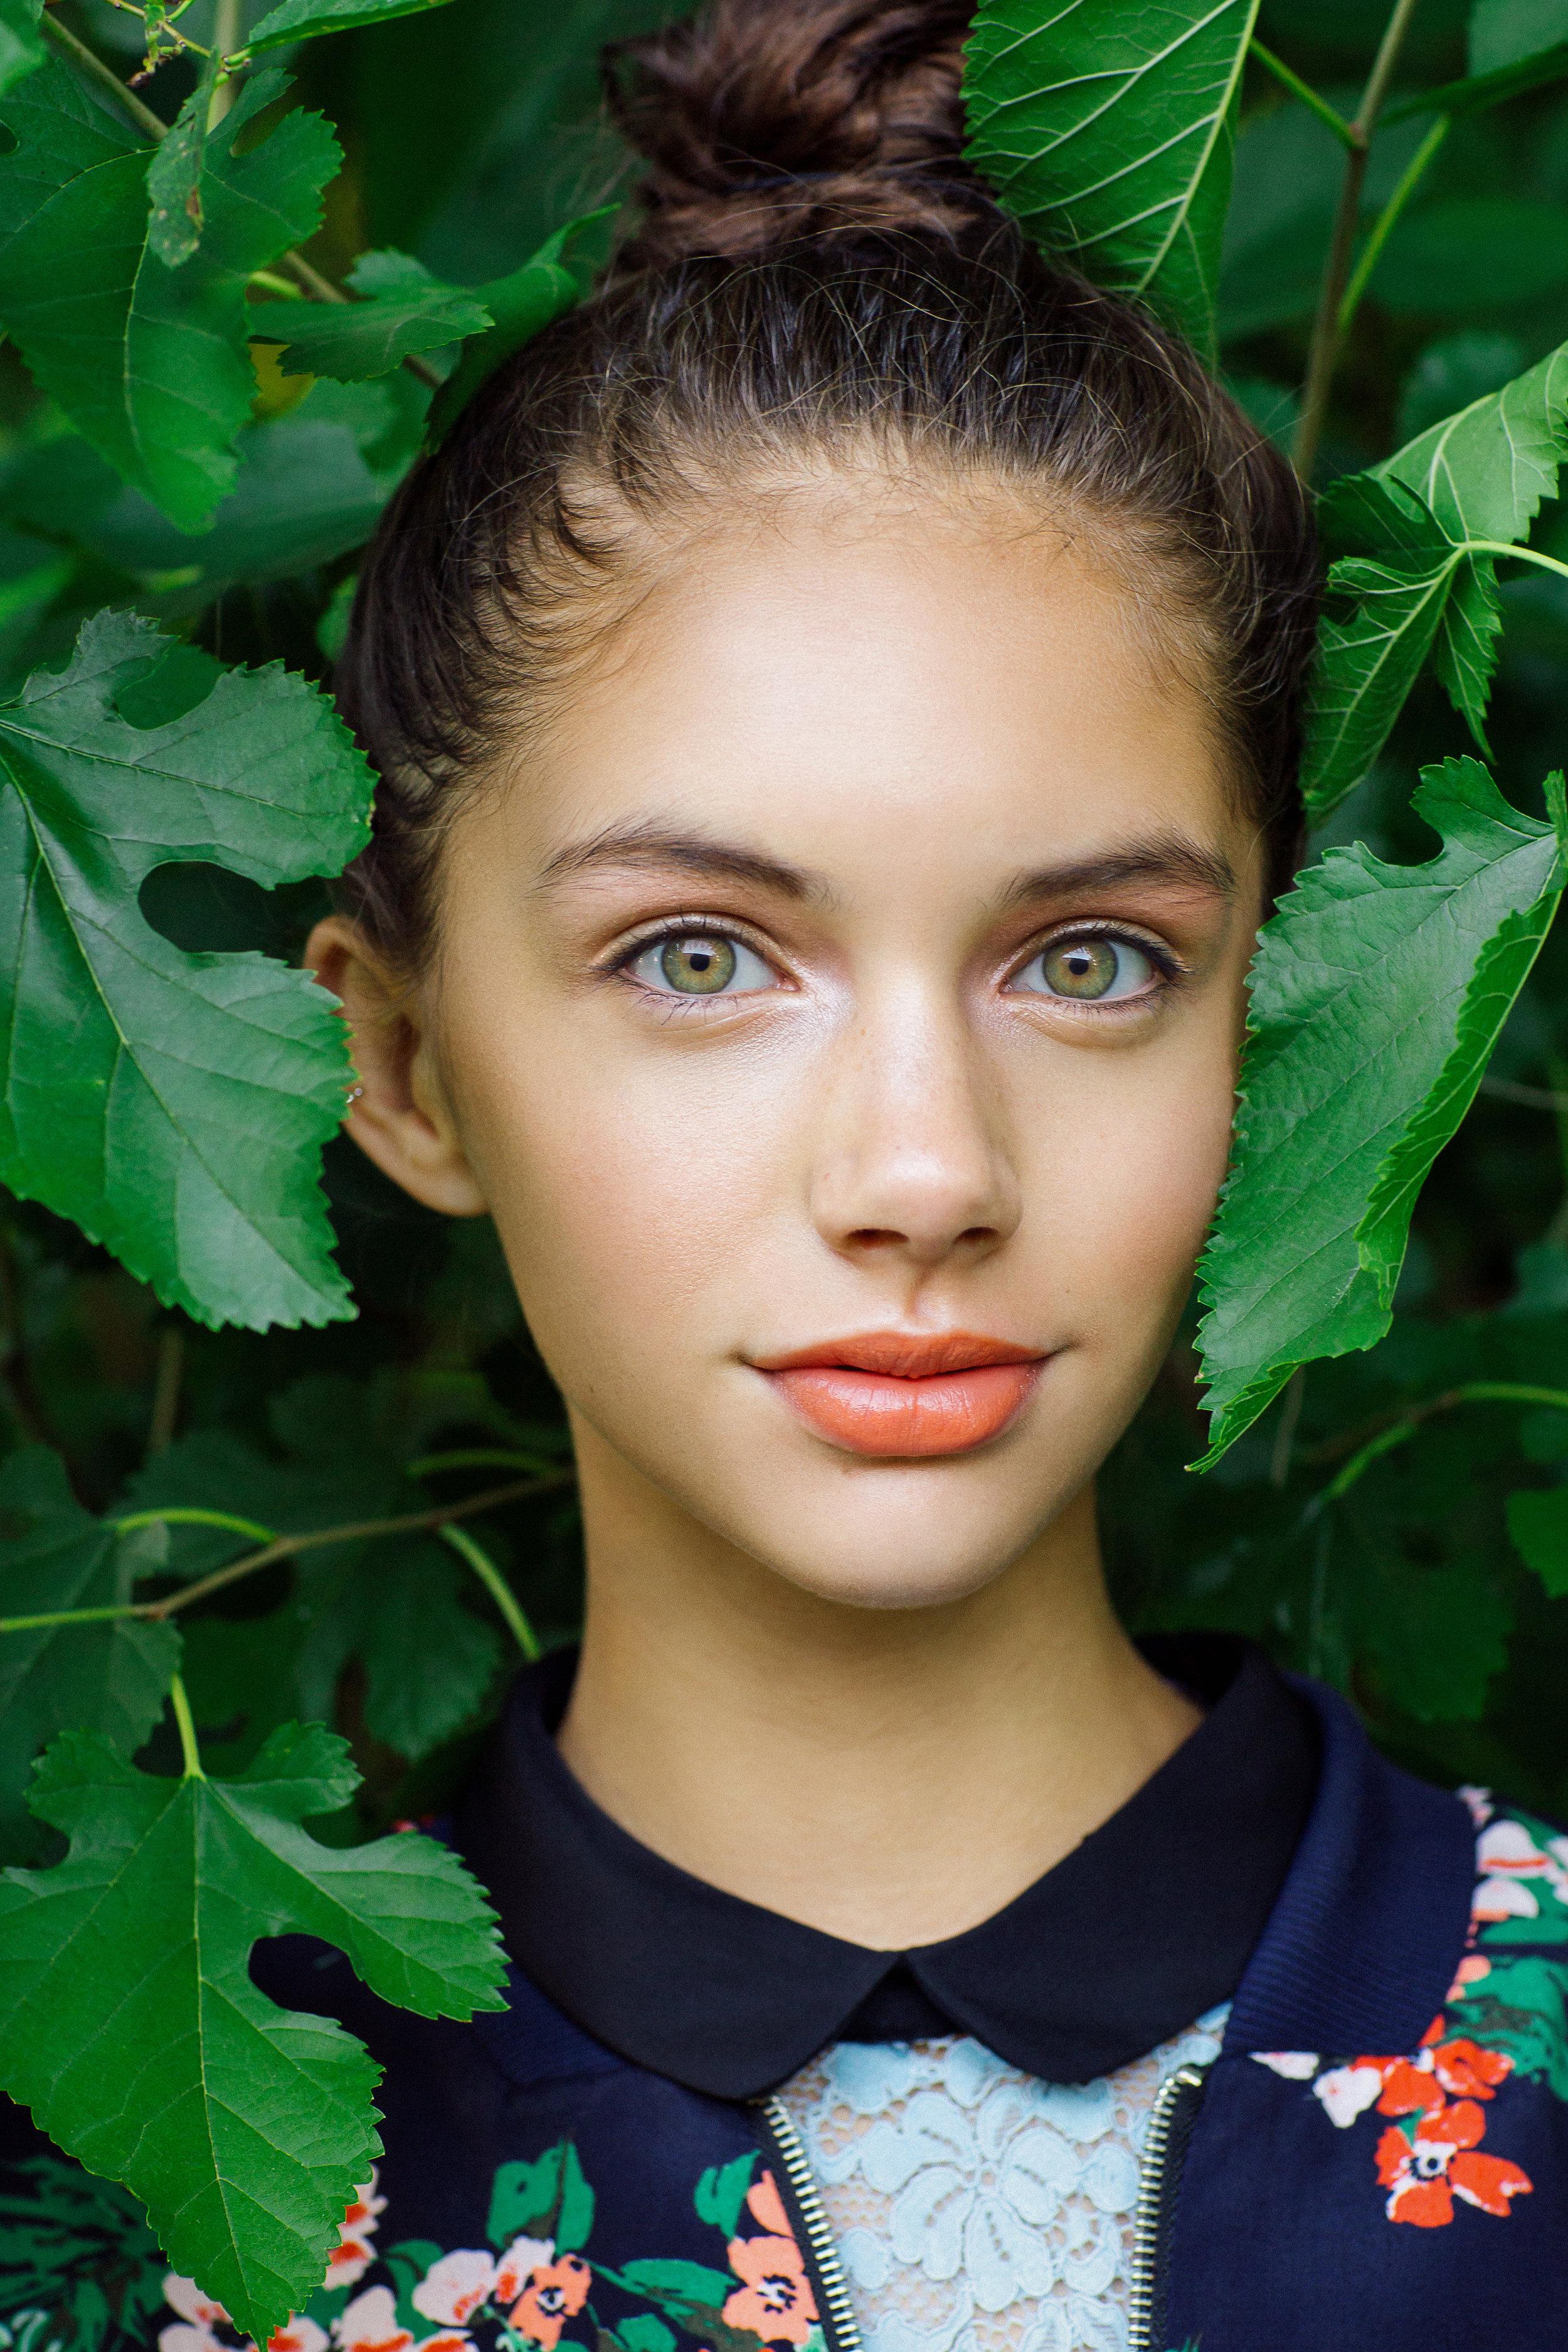 Joell Grace Perry, Model Citizen Magazine, Model Citizen App